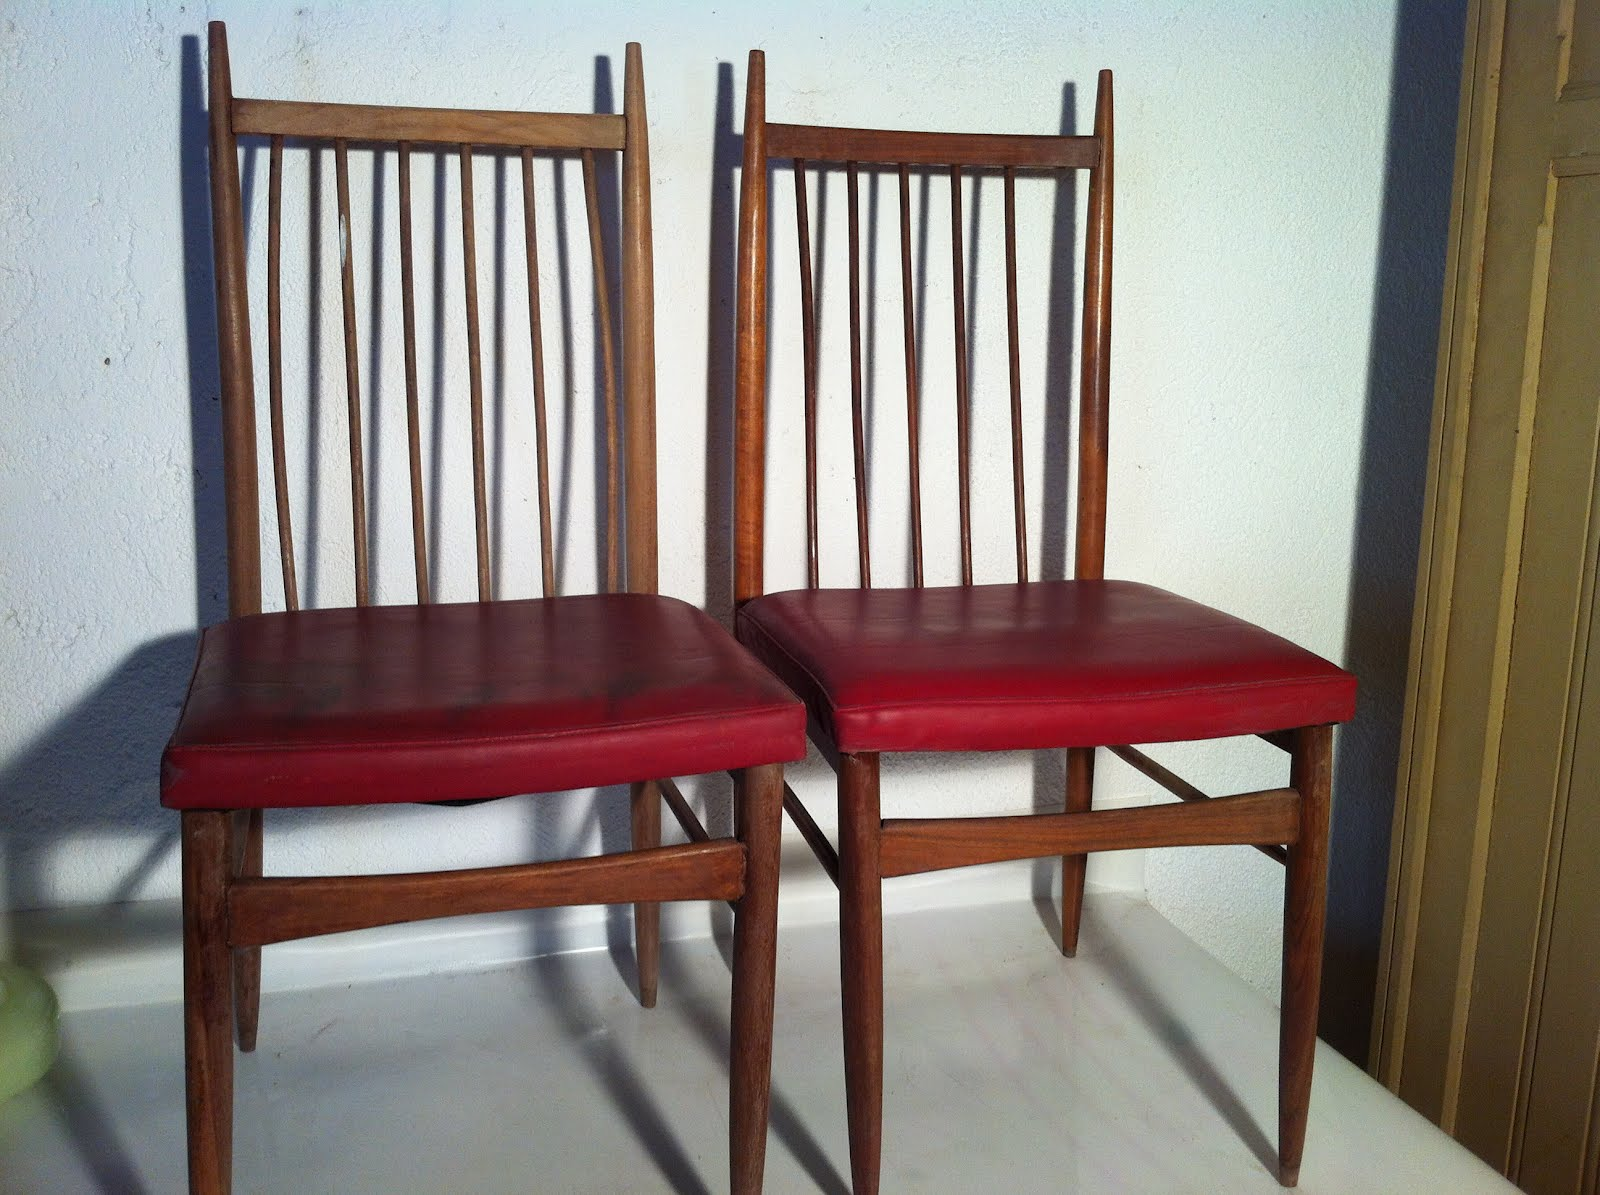 Decoraci n vintage antiguitats baraturantic sillas a os 60 39 s - Sillas anos 60 ...